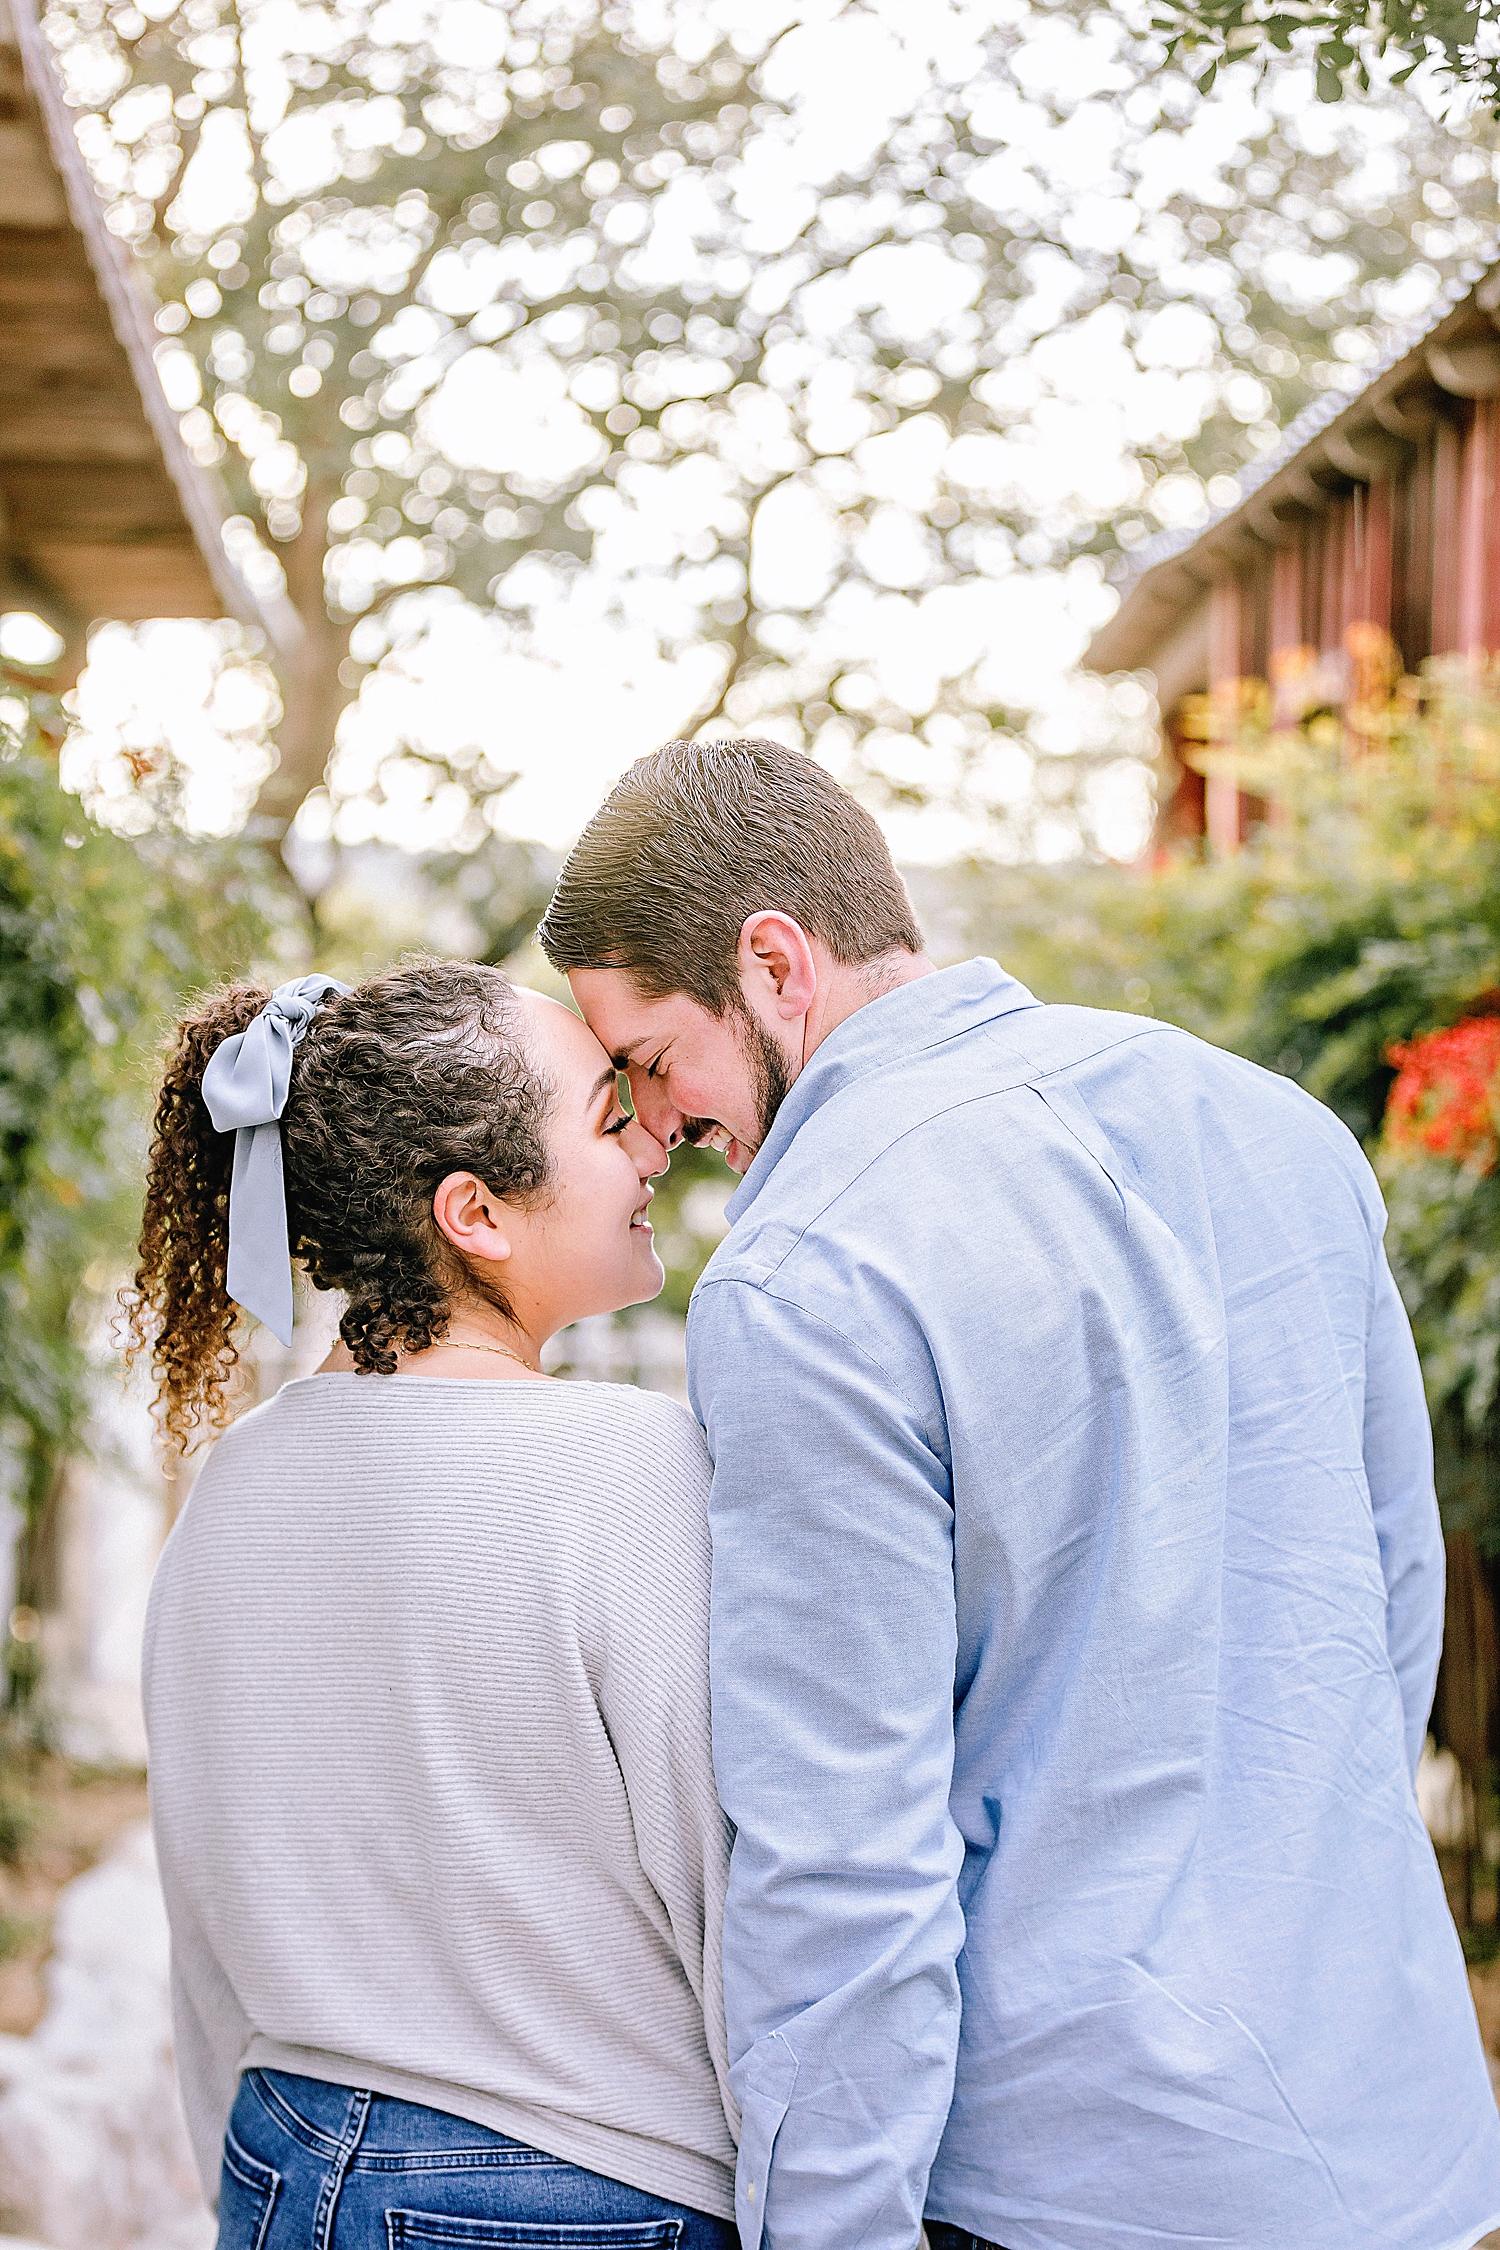 Engagement-photo-session-gruene-new-braunfels-texas-carly-barton-photography_0027.jpg